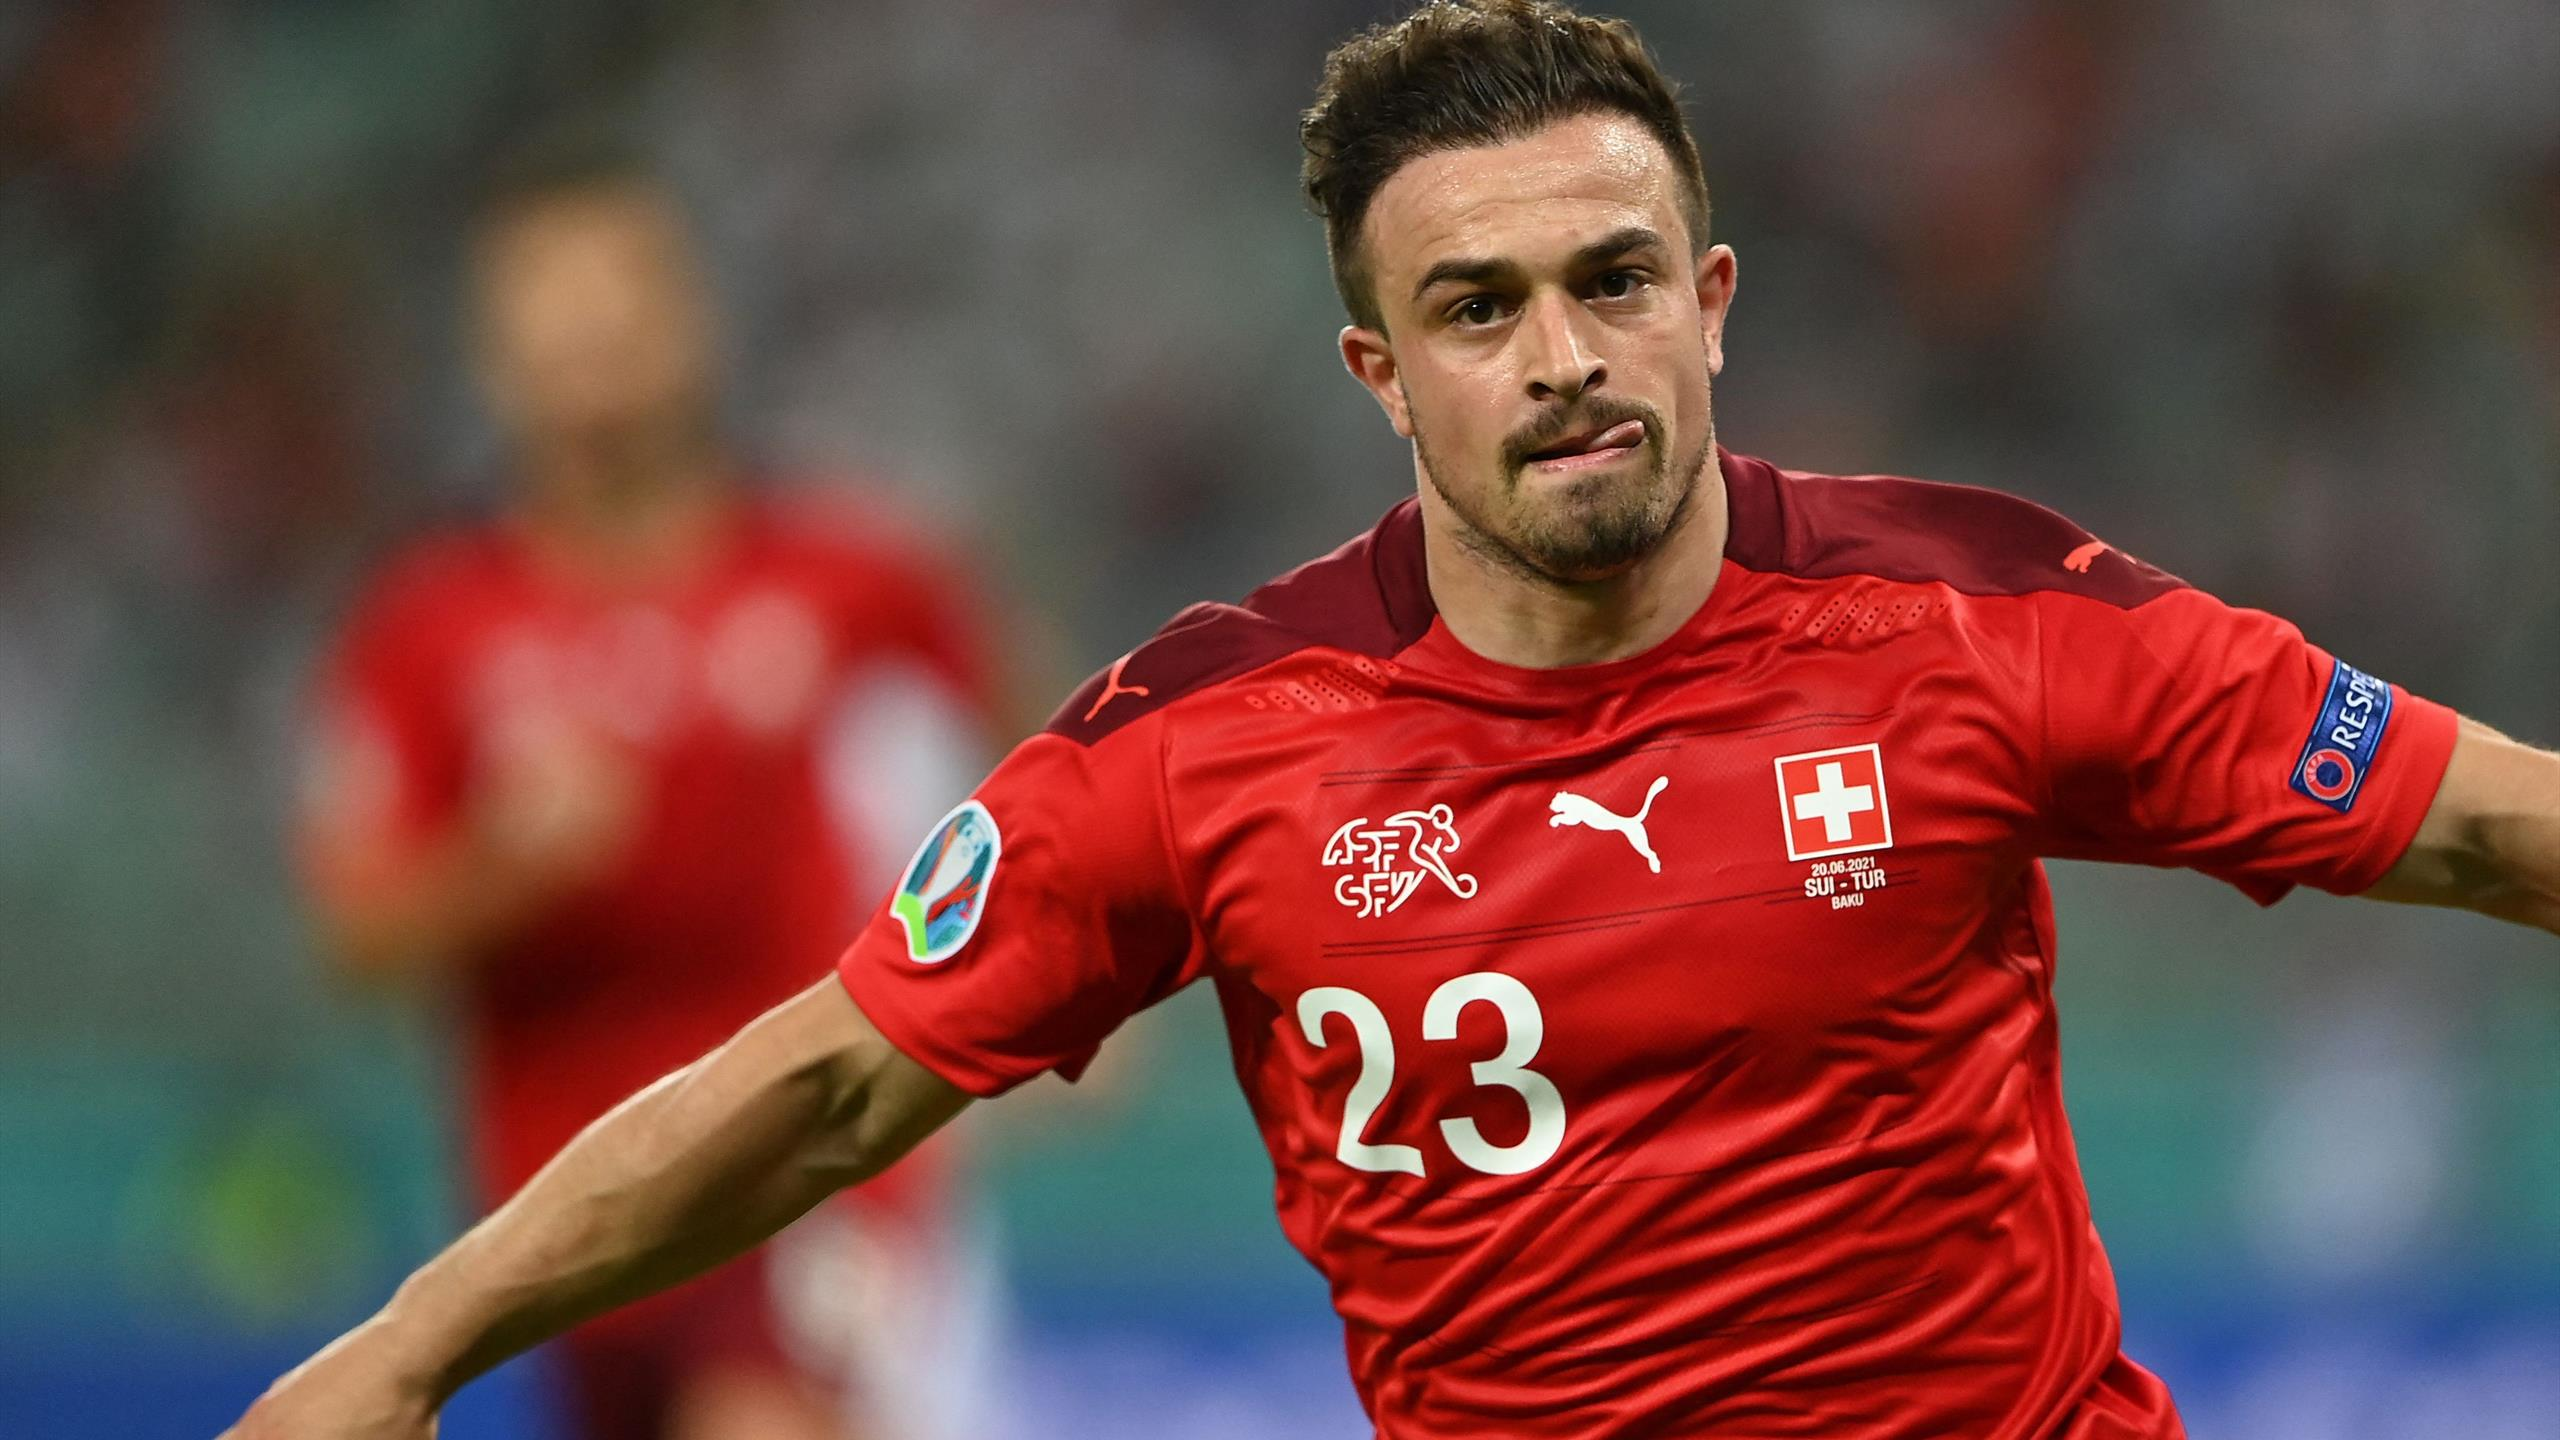 Xherdan Shaqiri em vitória da Suiça sobre a Turquia na Euro 2020